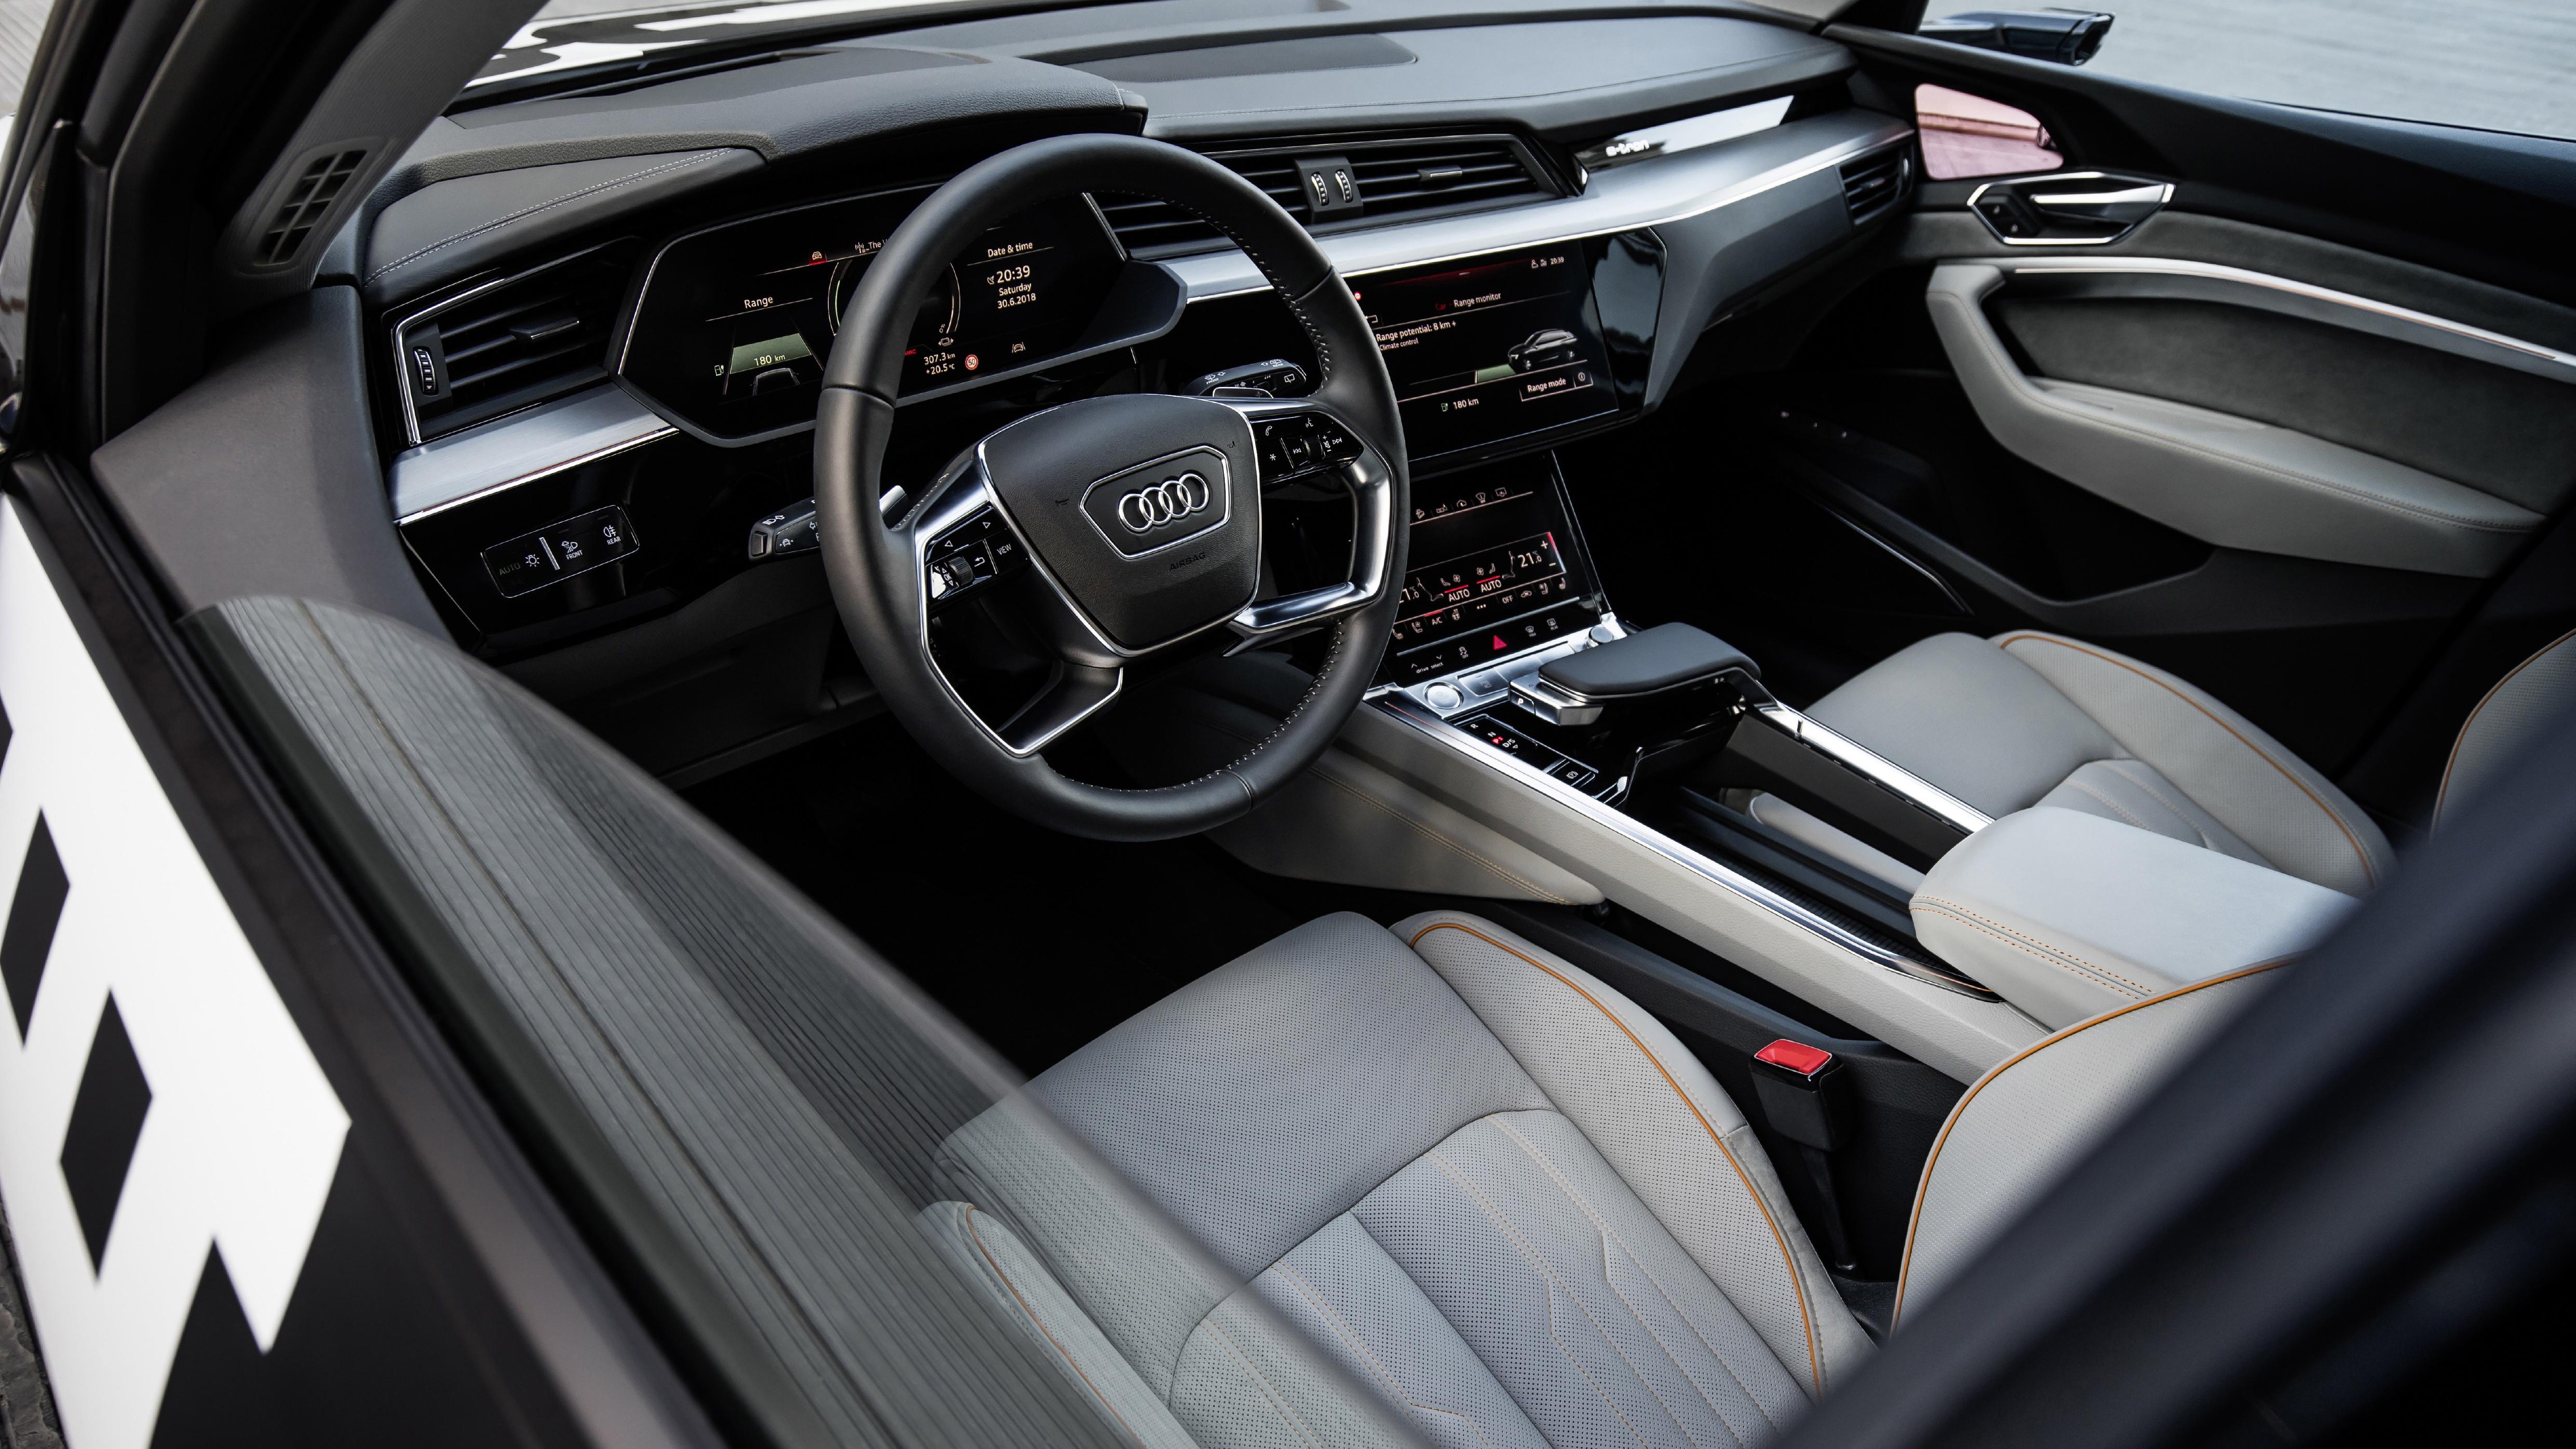 Take a look inside Audi's e-tron electric SUV | Top Gear